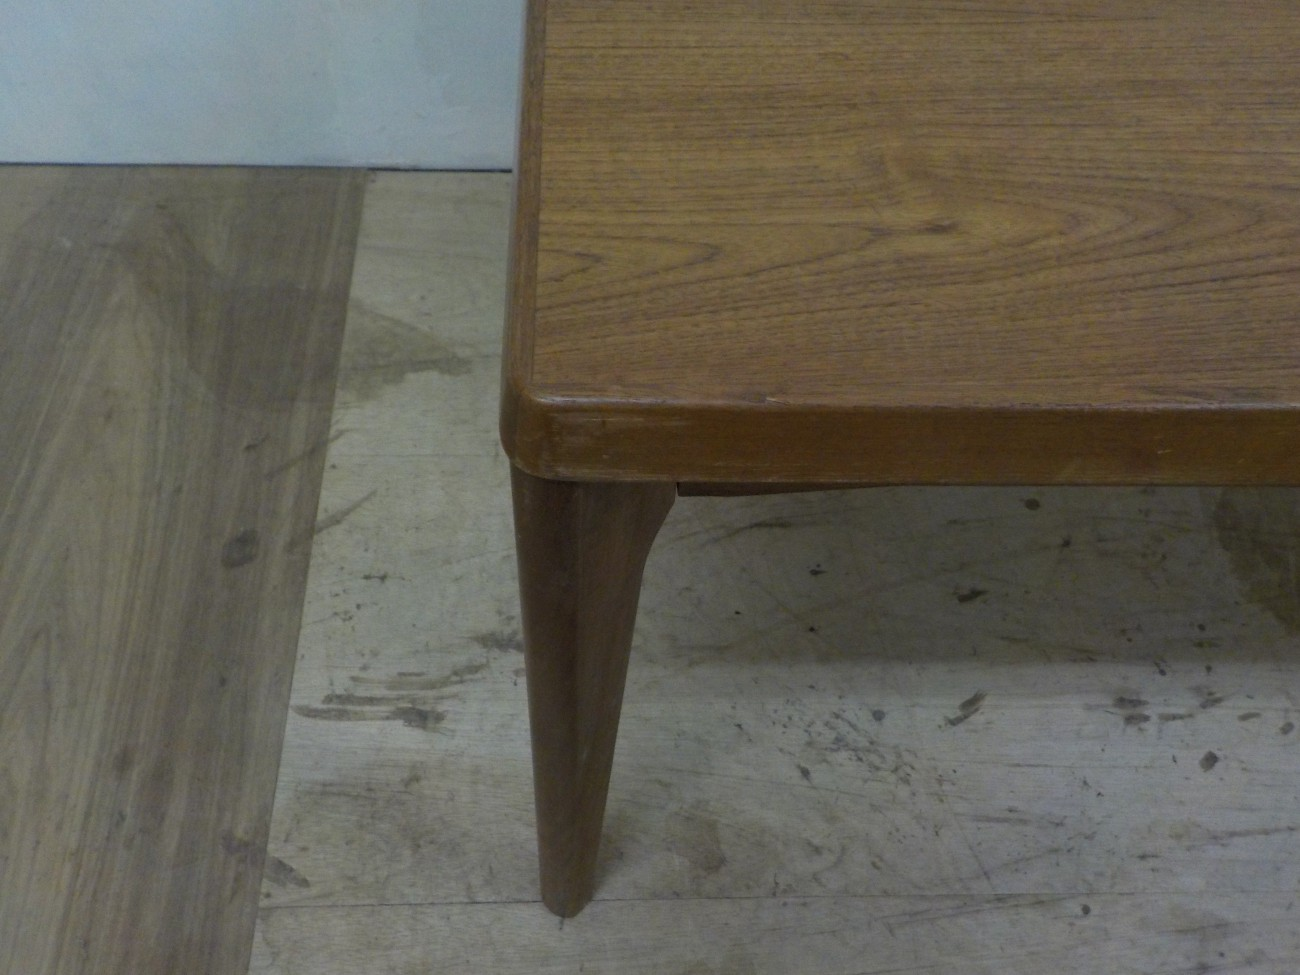 VEJLE STOLE-og MOBELFABRIK Dining table / チーク エクステンション ダイニングテーブル / stock2012-22